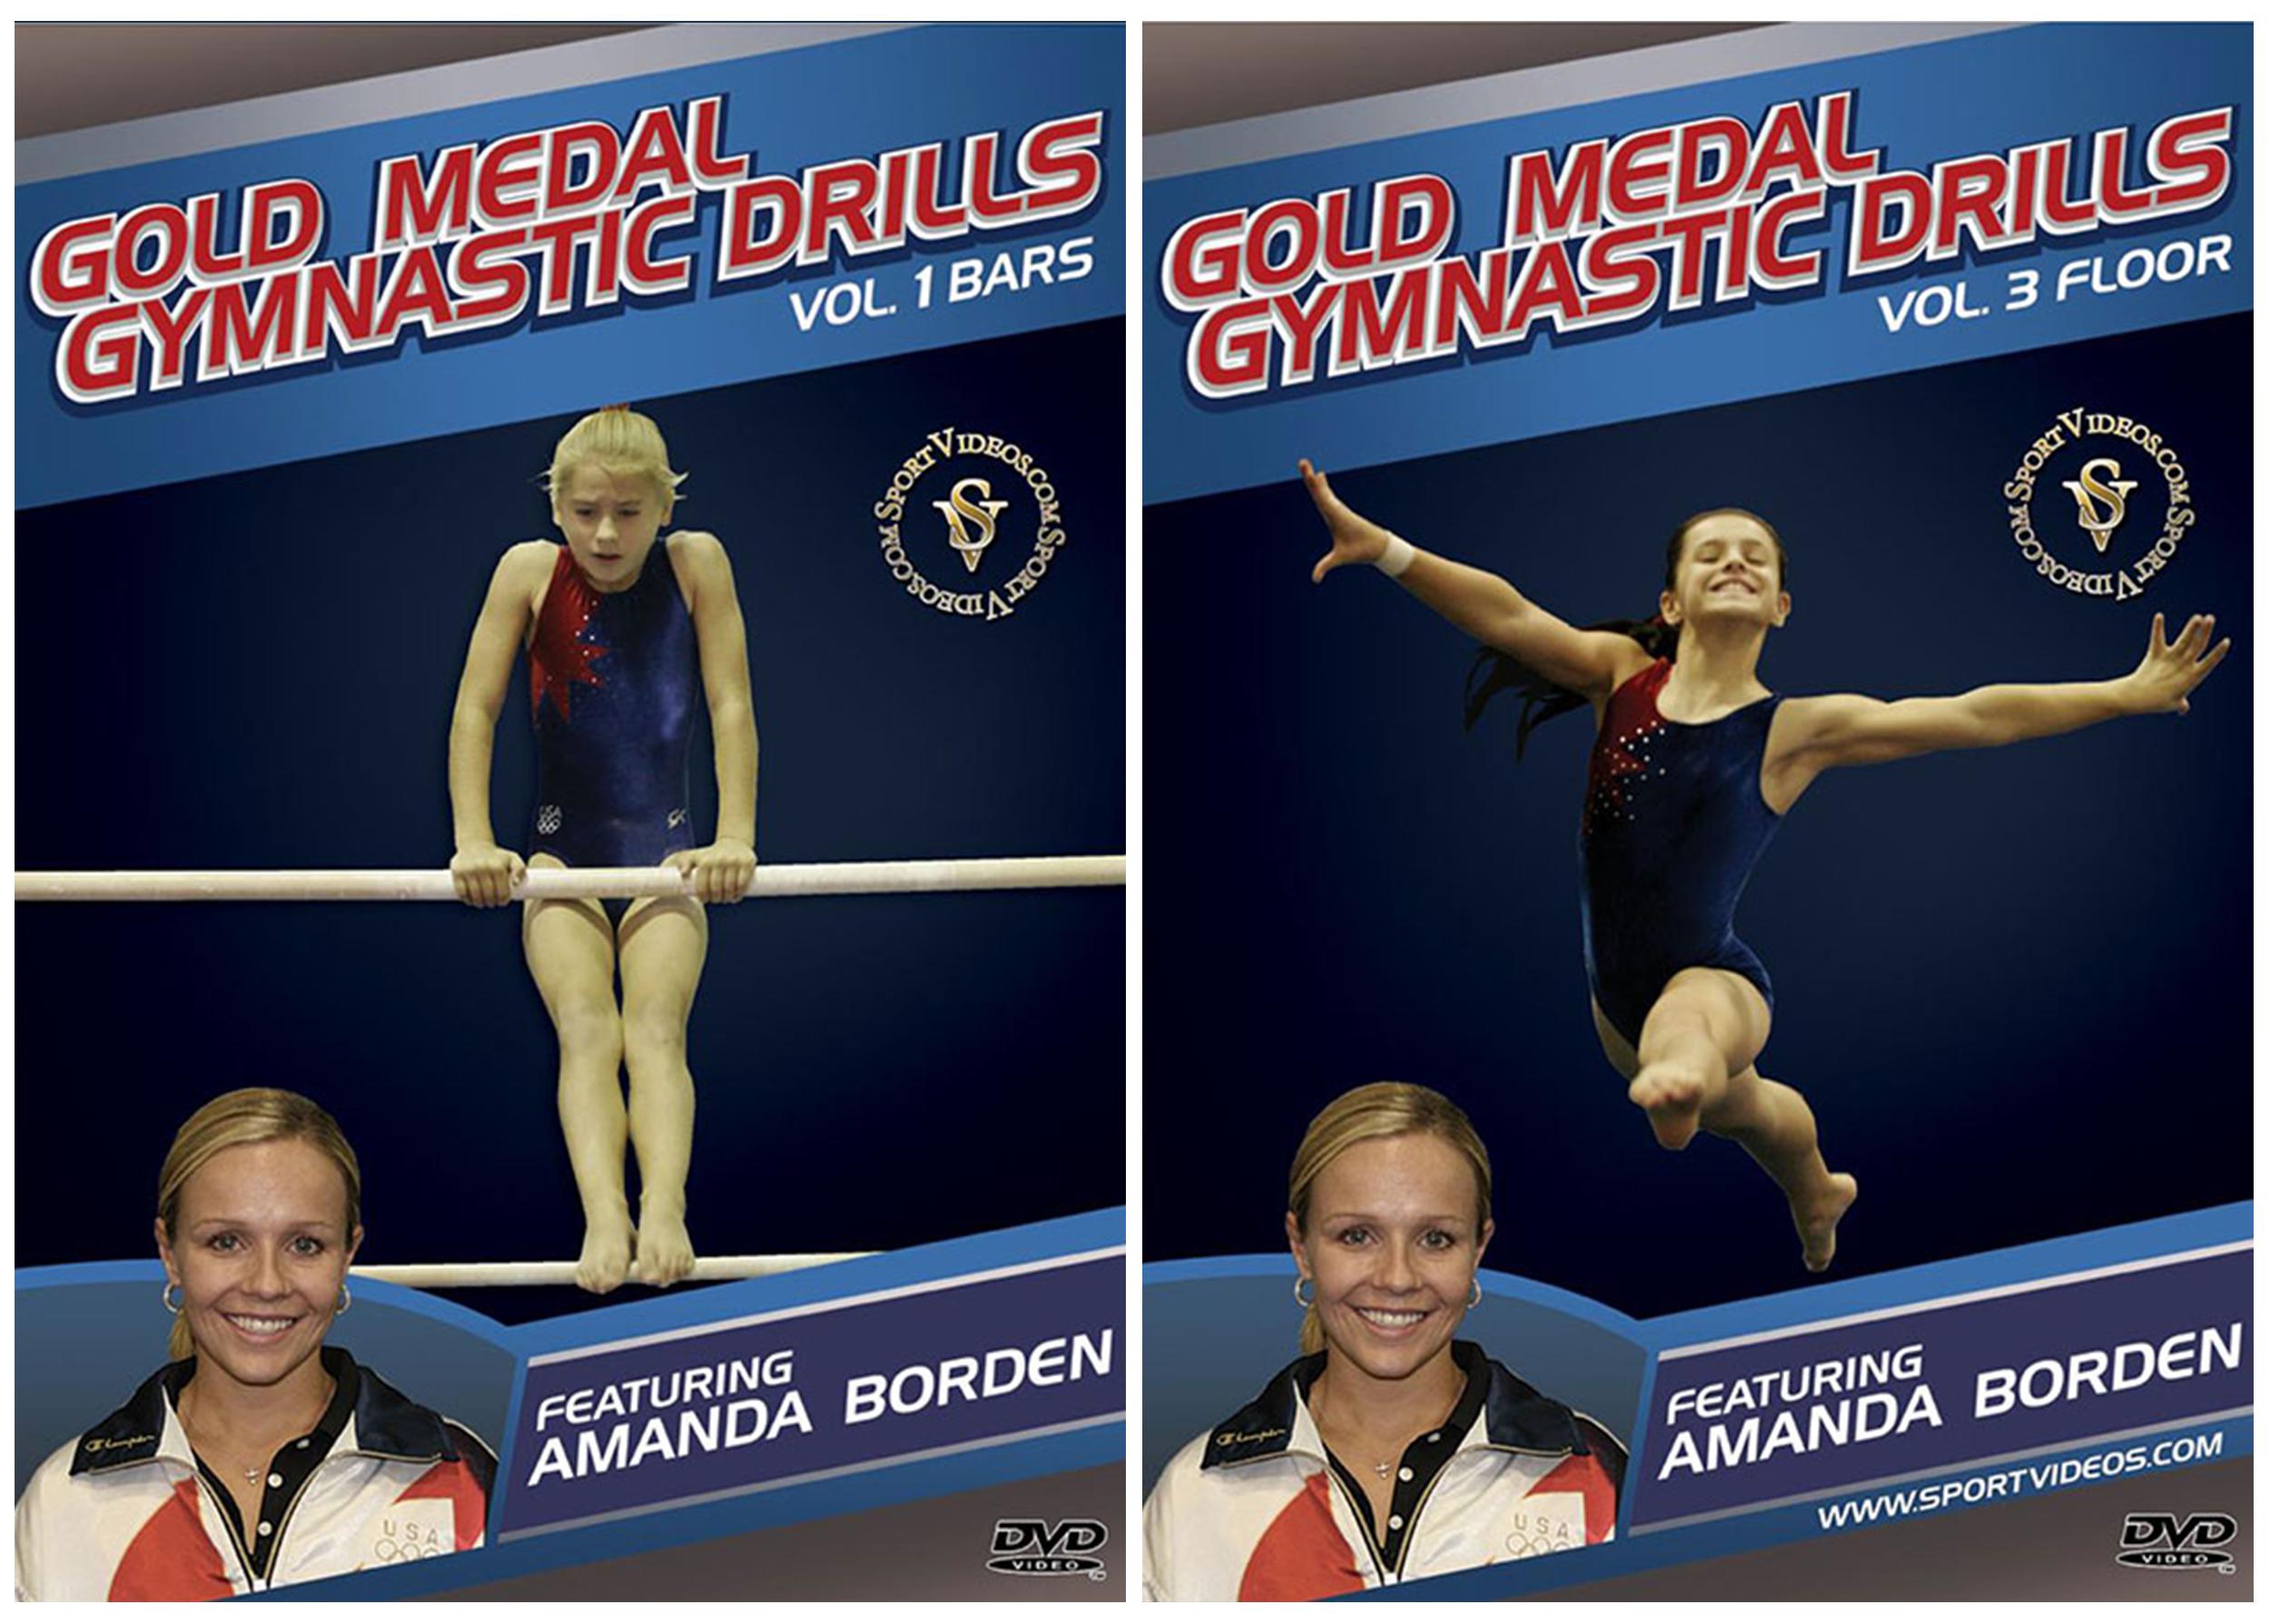 Gold Medal Gymnastics 2 DVD Set